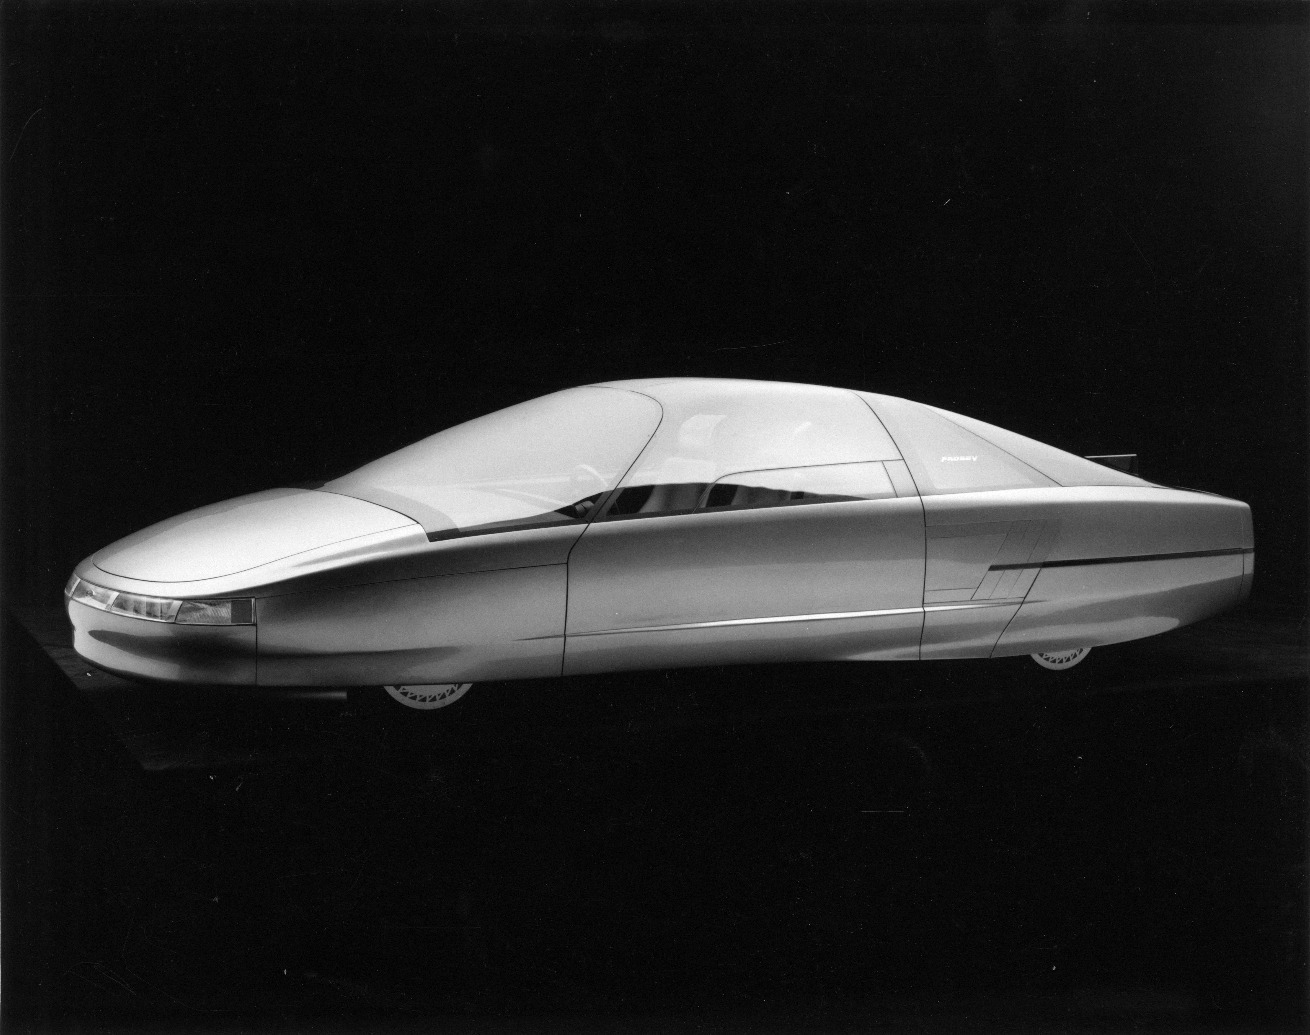 1985-Ford-Probe-V-Concept-03